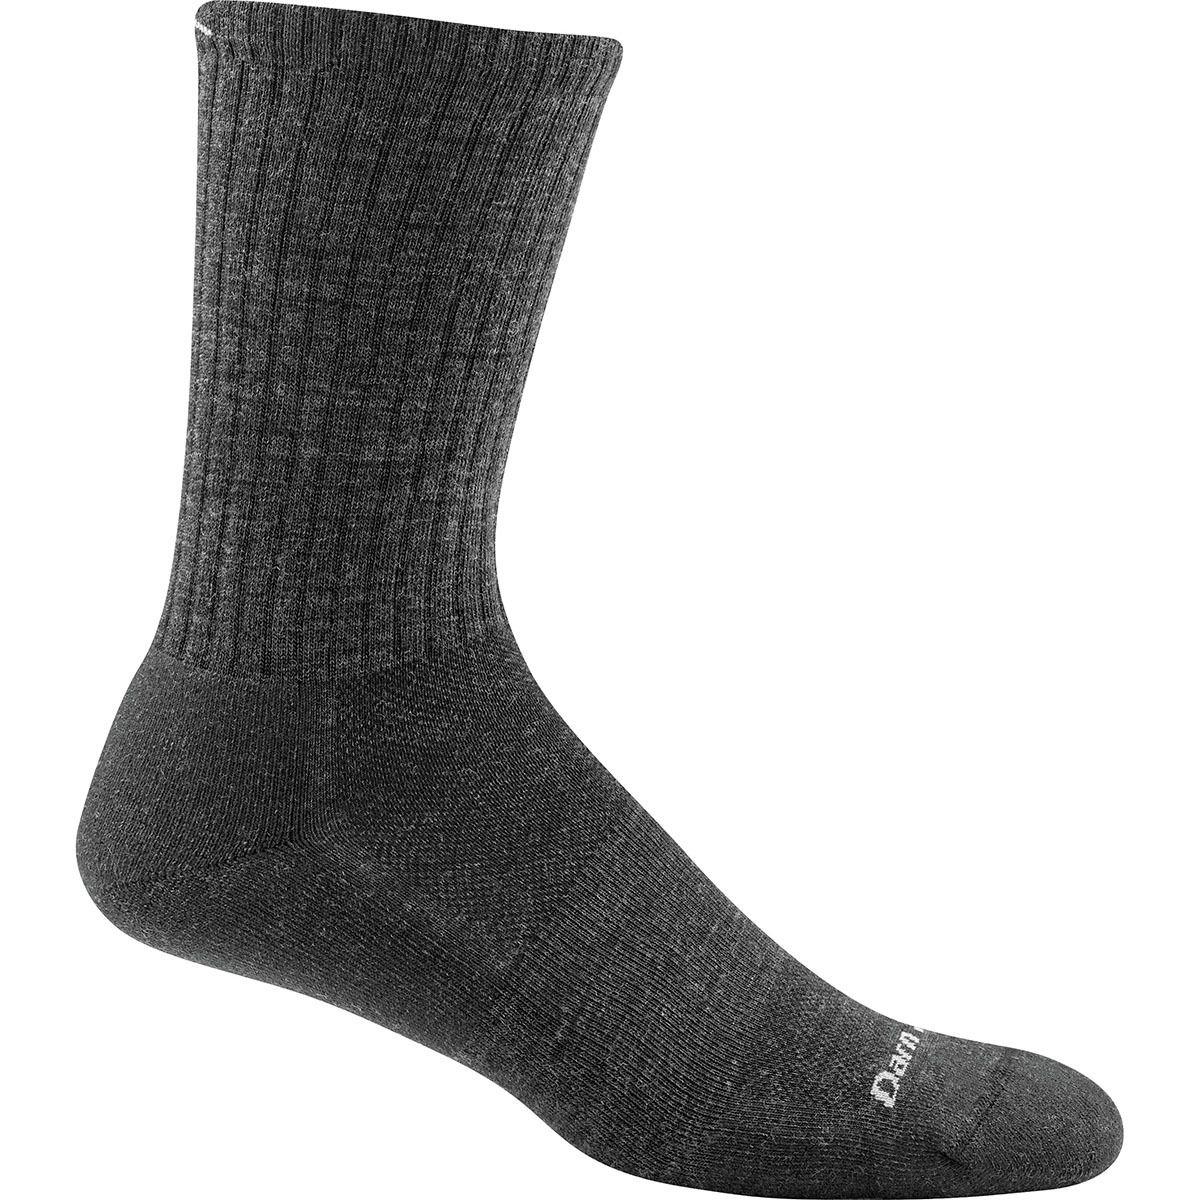 The Standard Crew Light Cushion Sock - Men